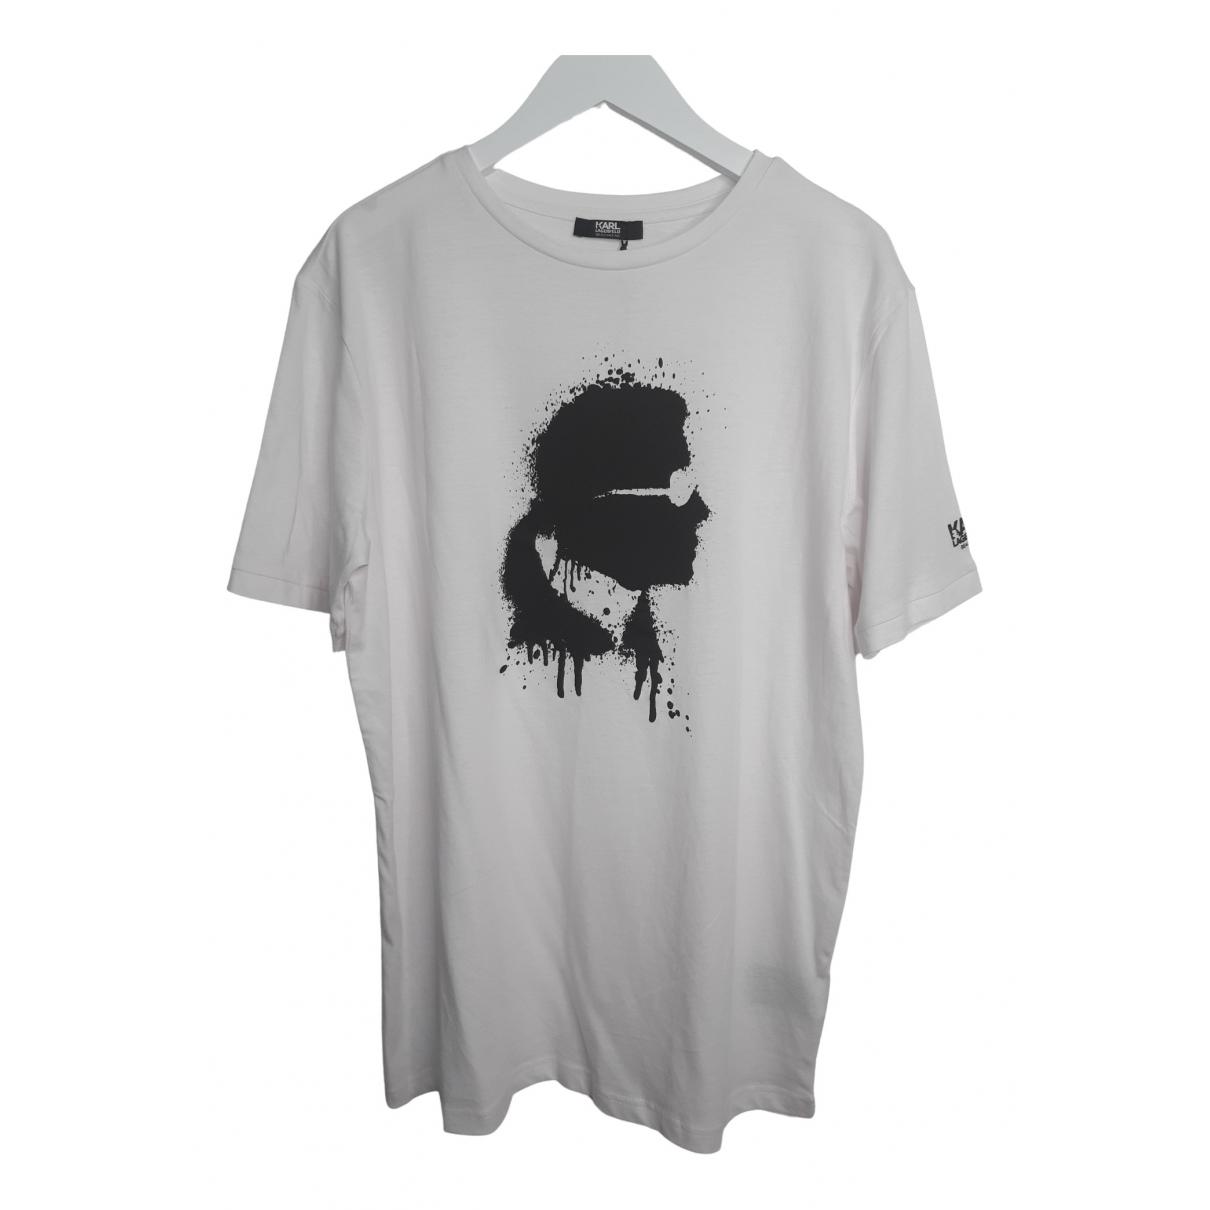 Karl \N T-Shirts in  Weiss Baumwolle